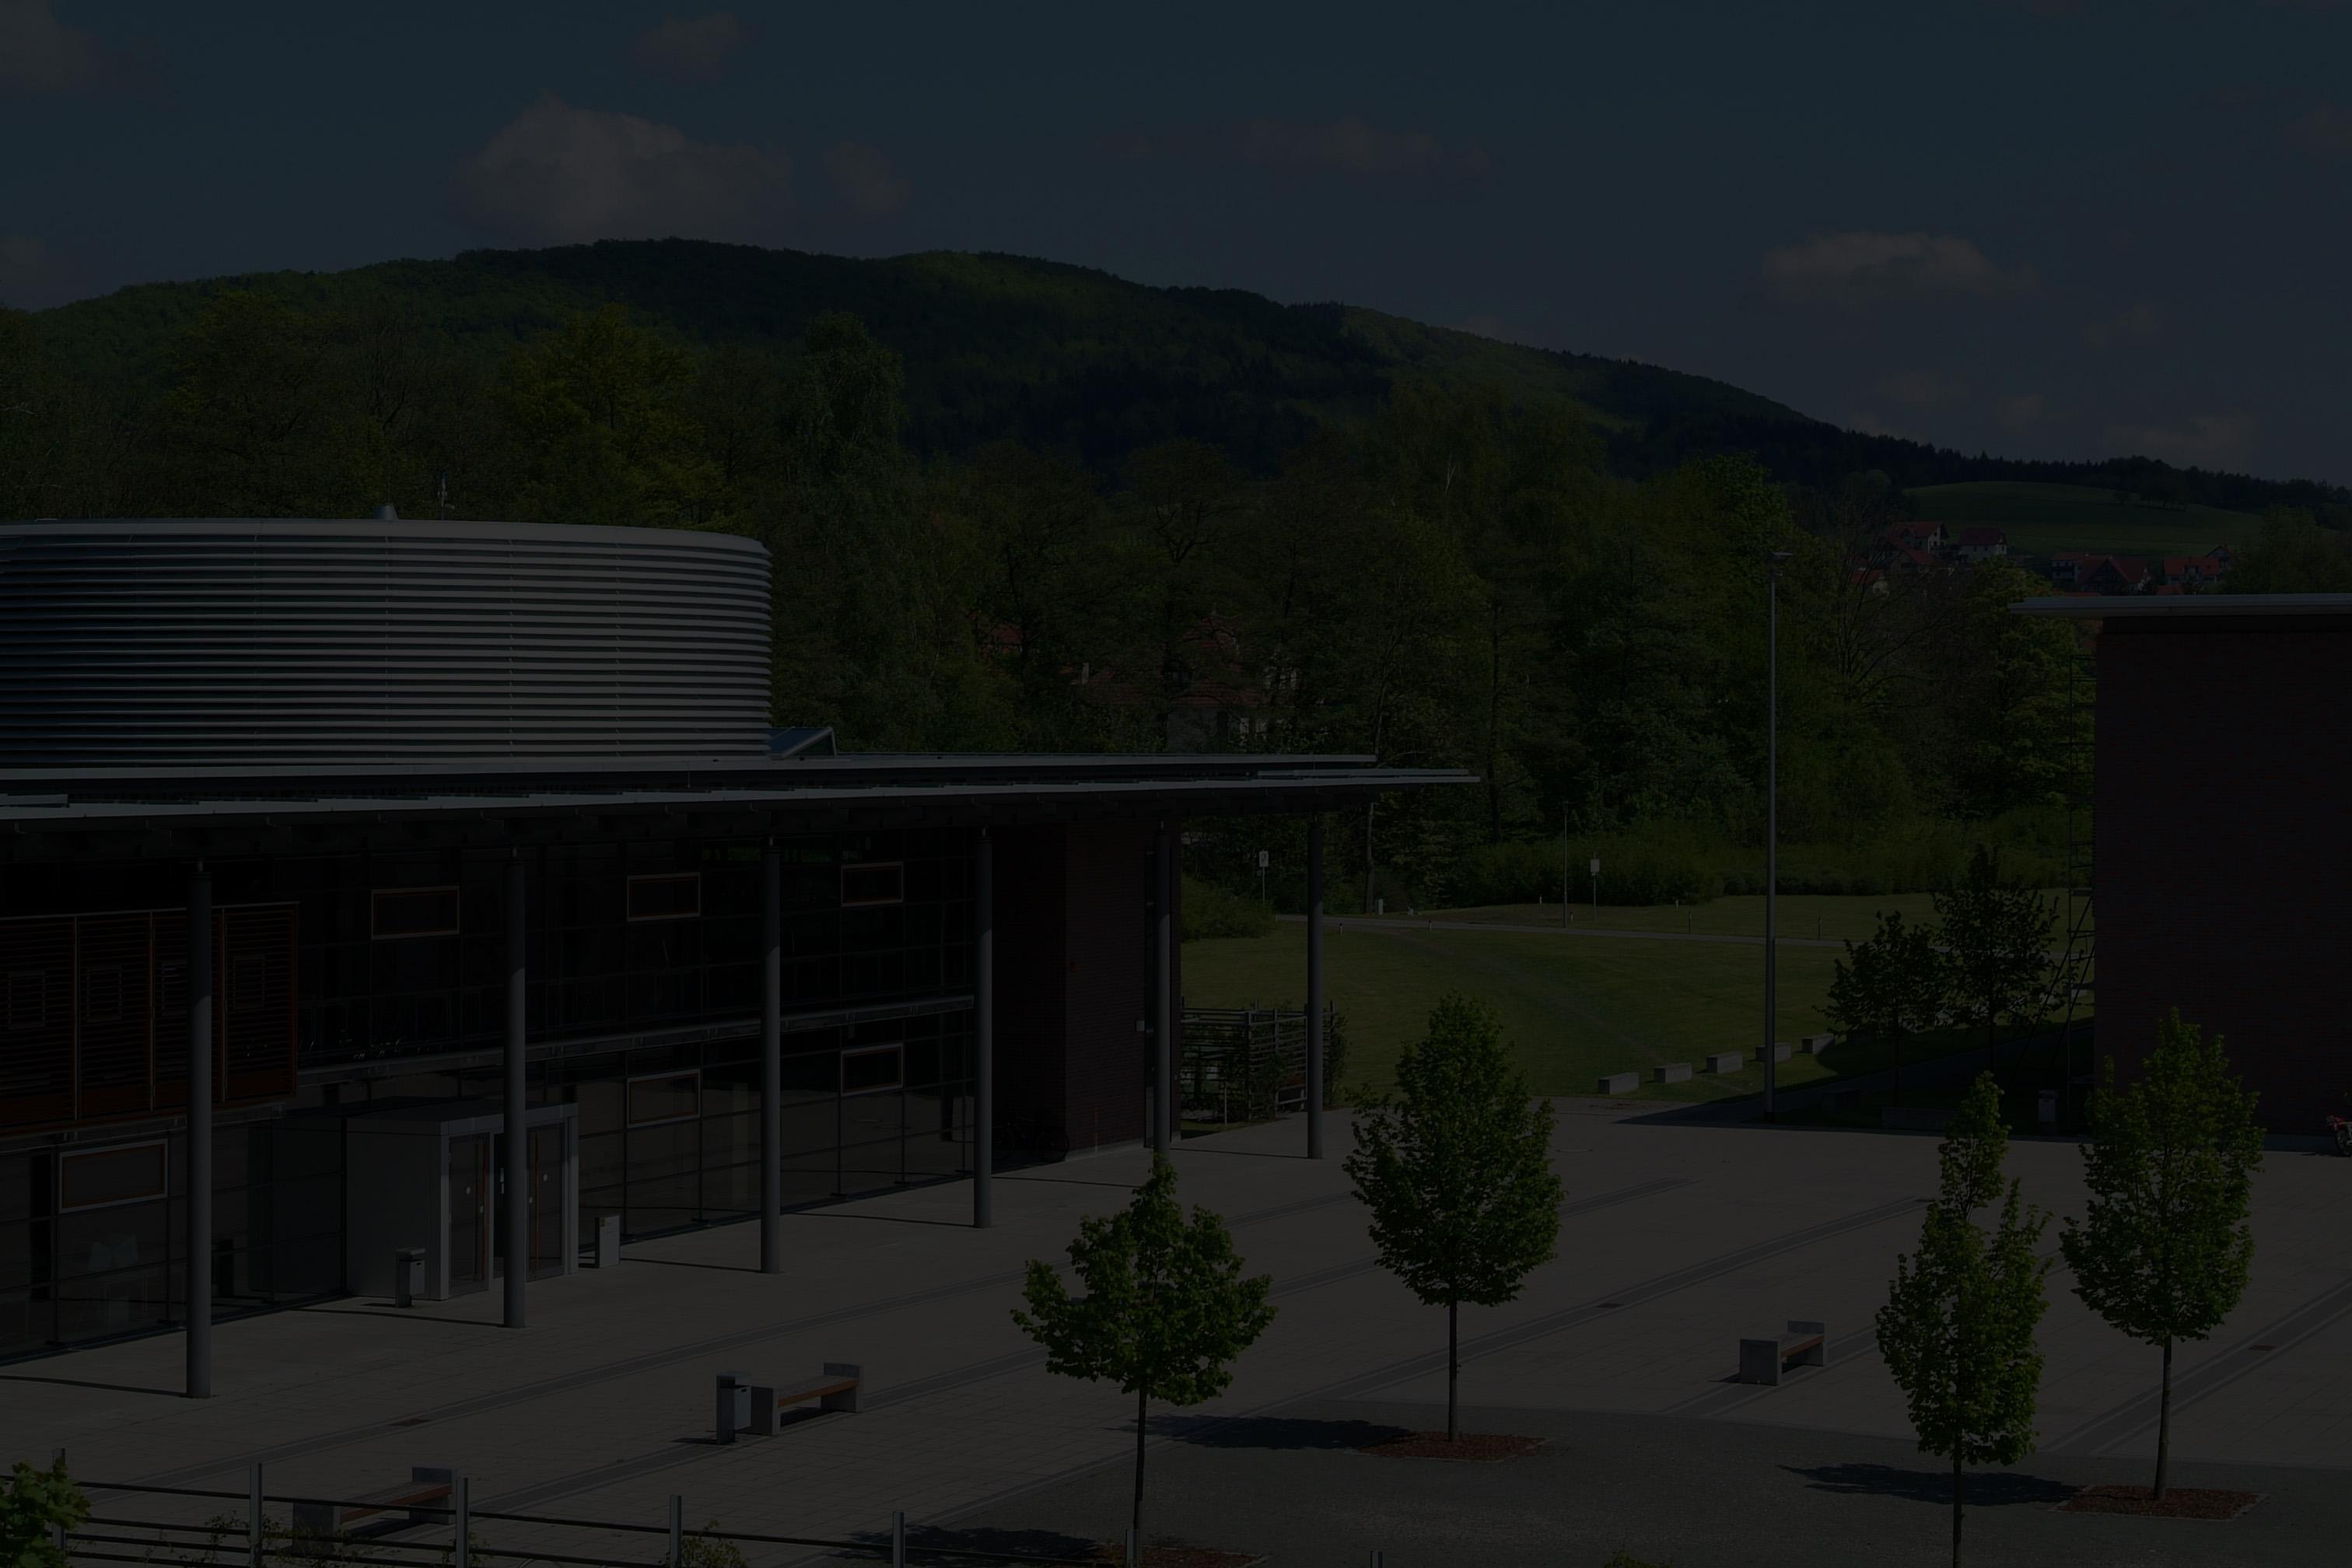 intermediale 2015 - FH Schmalkalden